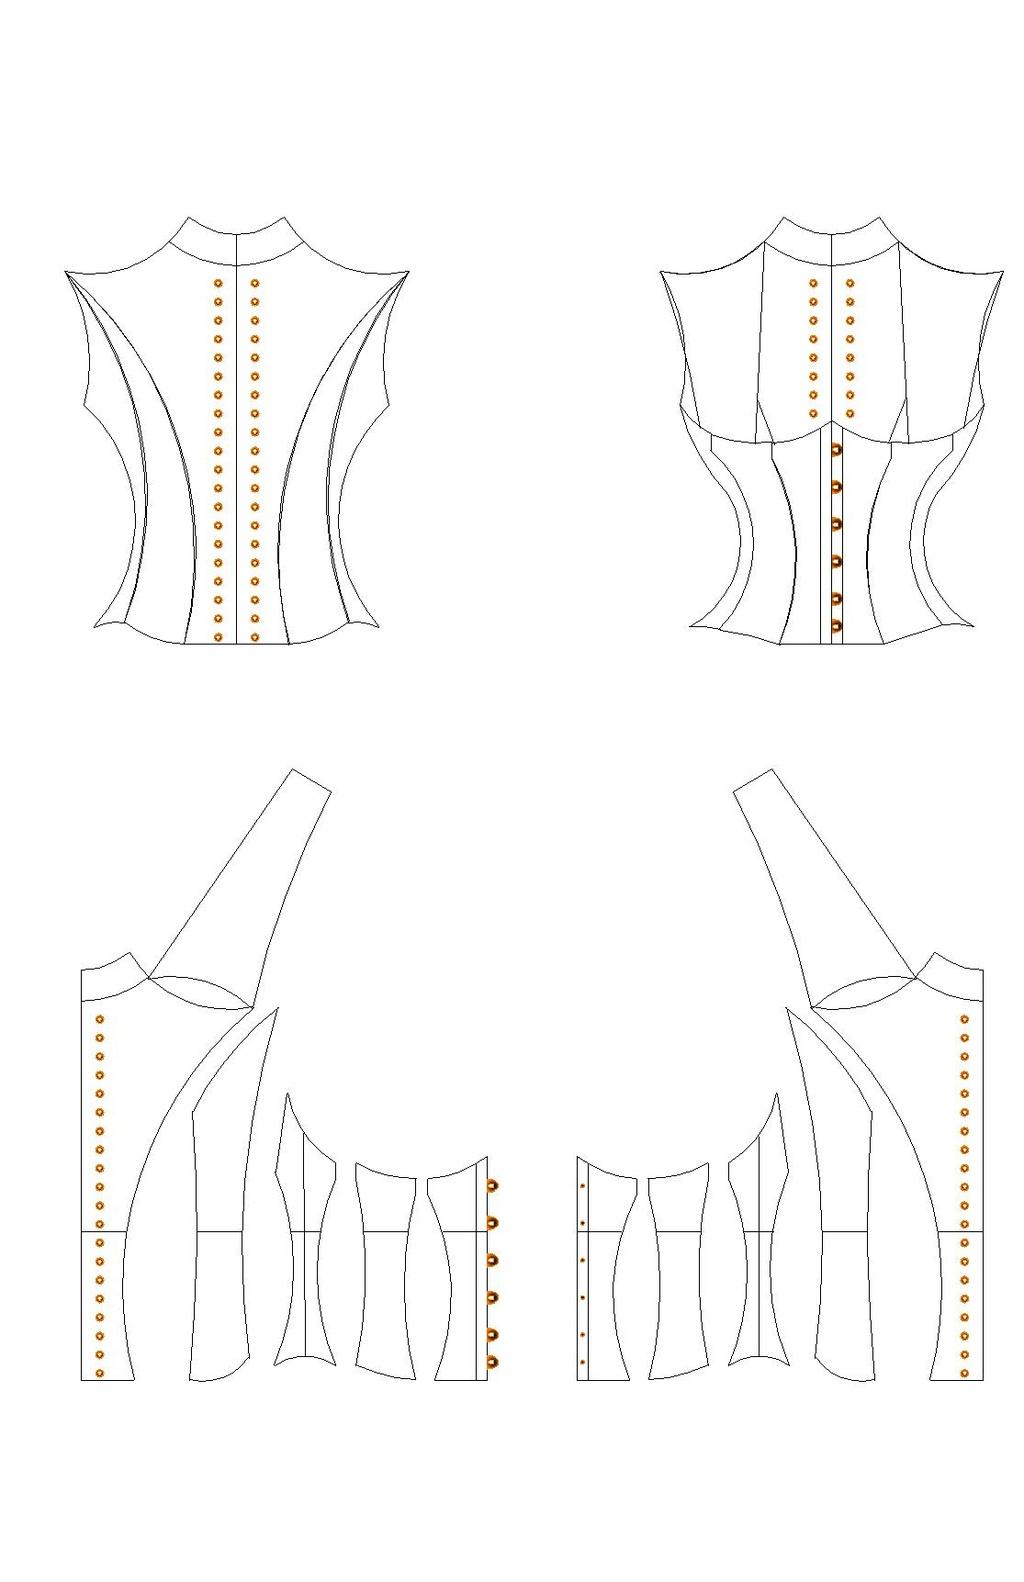 [MULTI-STYLES] Gilet corseté façon Dracula's Clothing Corset10